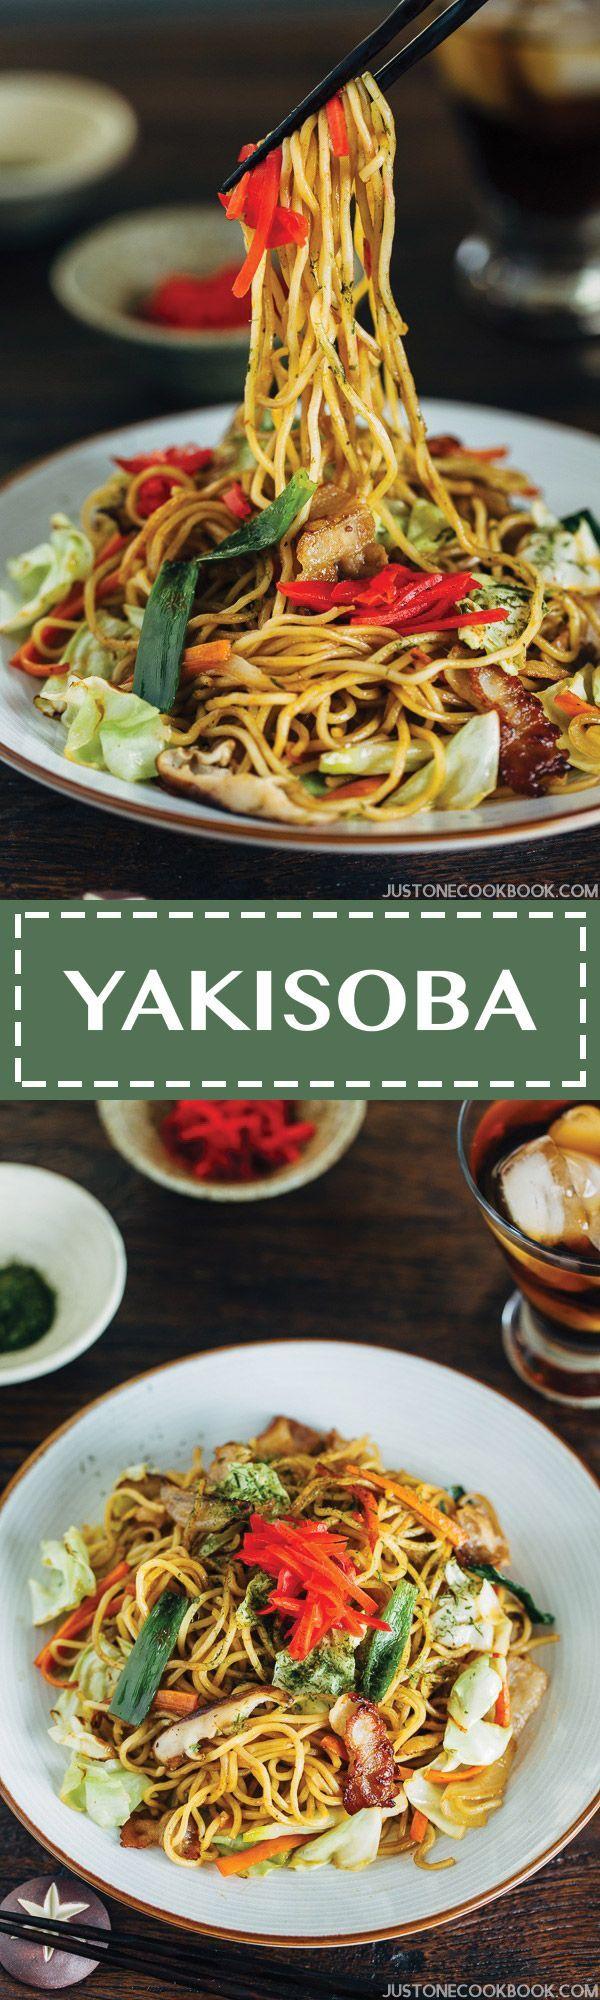 Yakisoba 焼きそば